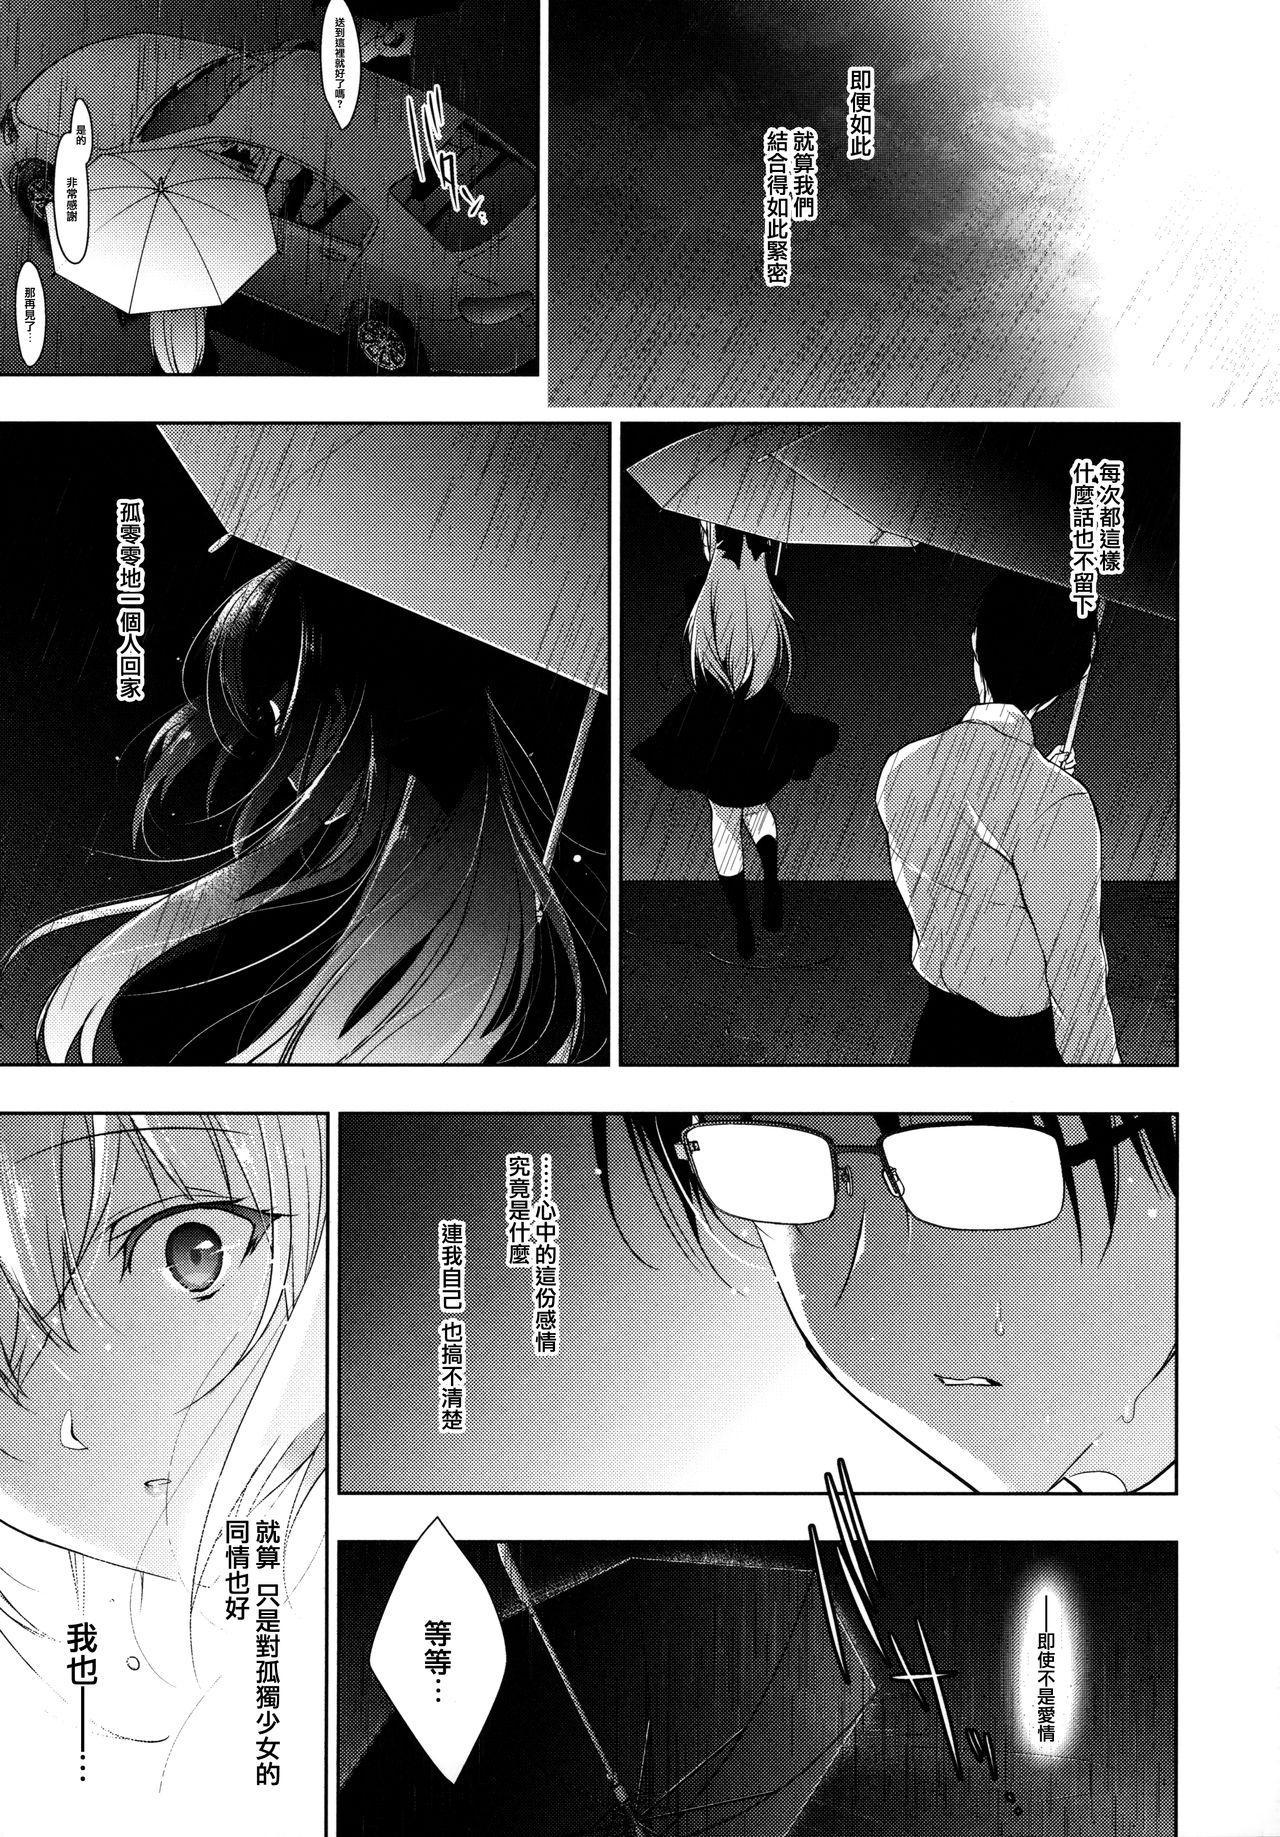 Shoujo Kaishun 7 + Ninokoya C97 Melonbooks Omakebon 38